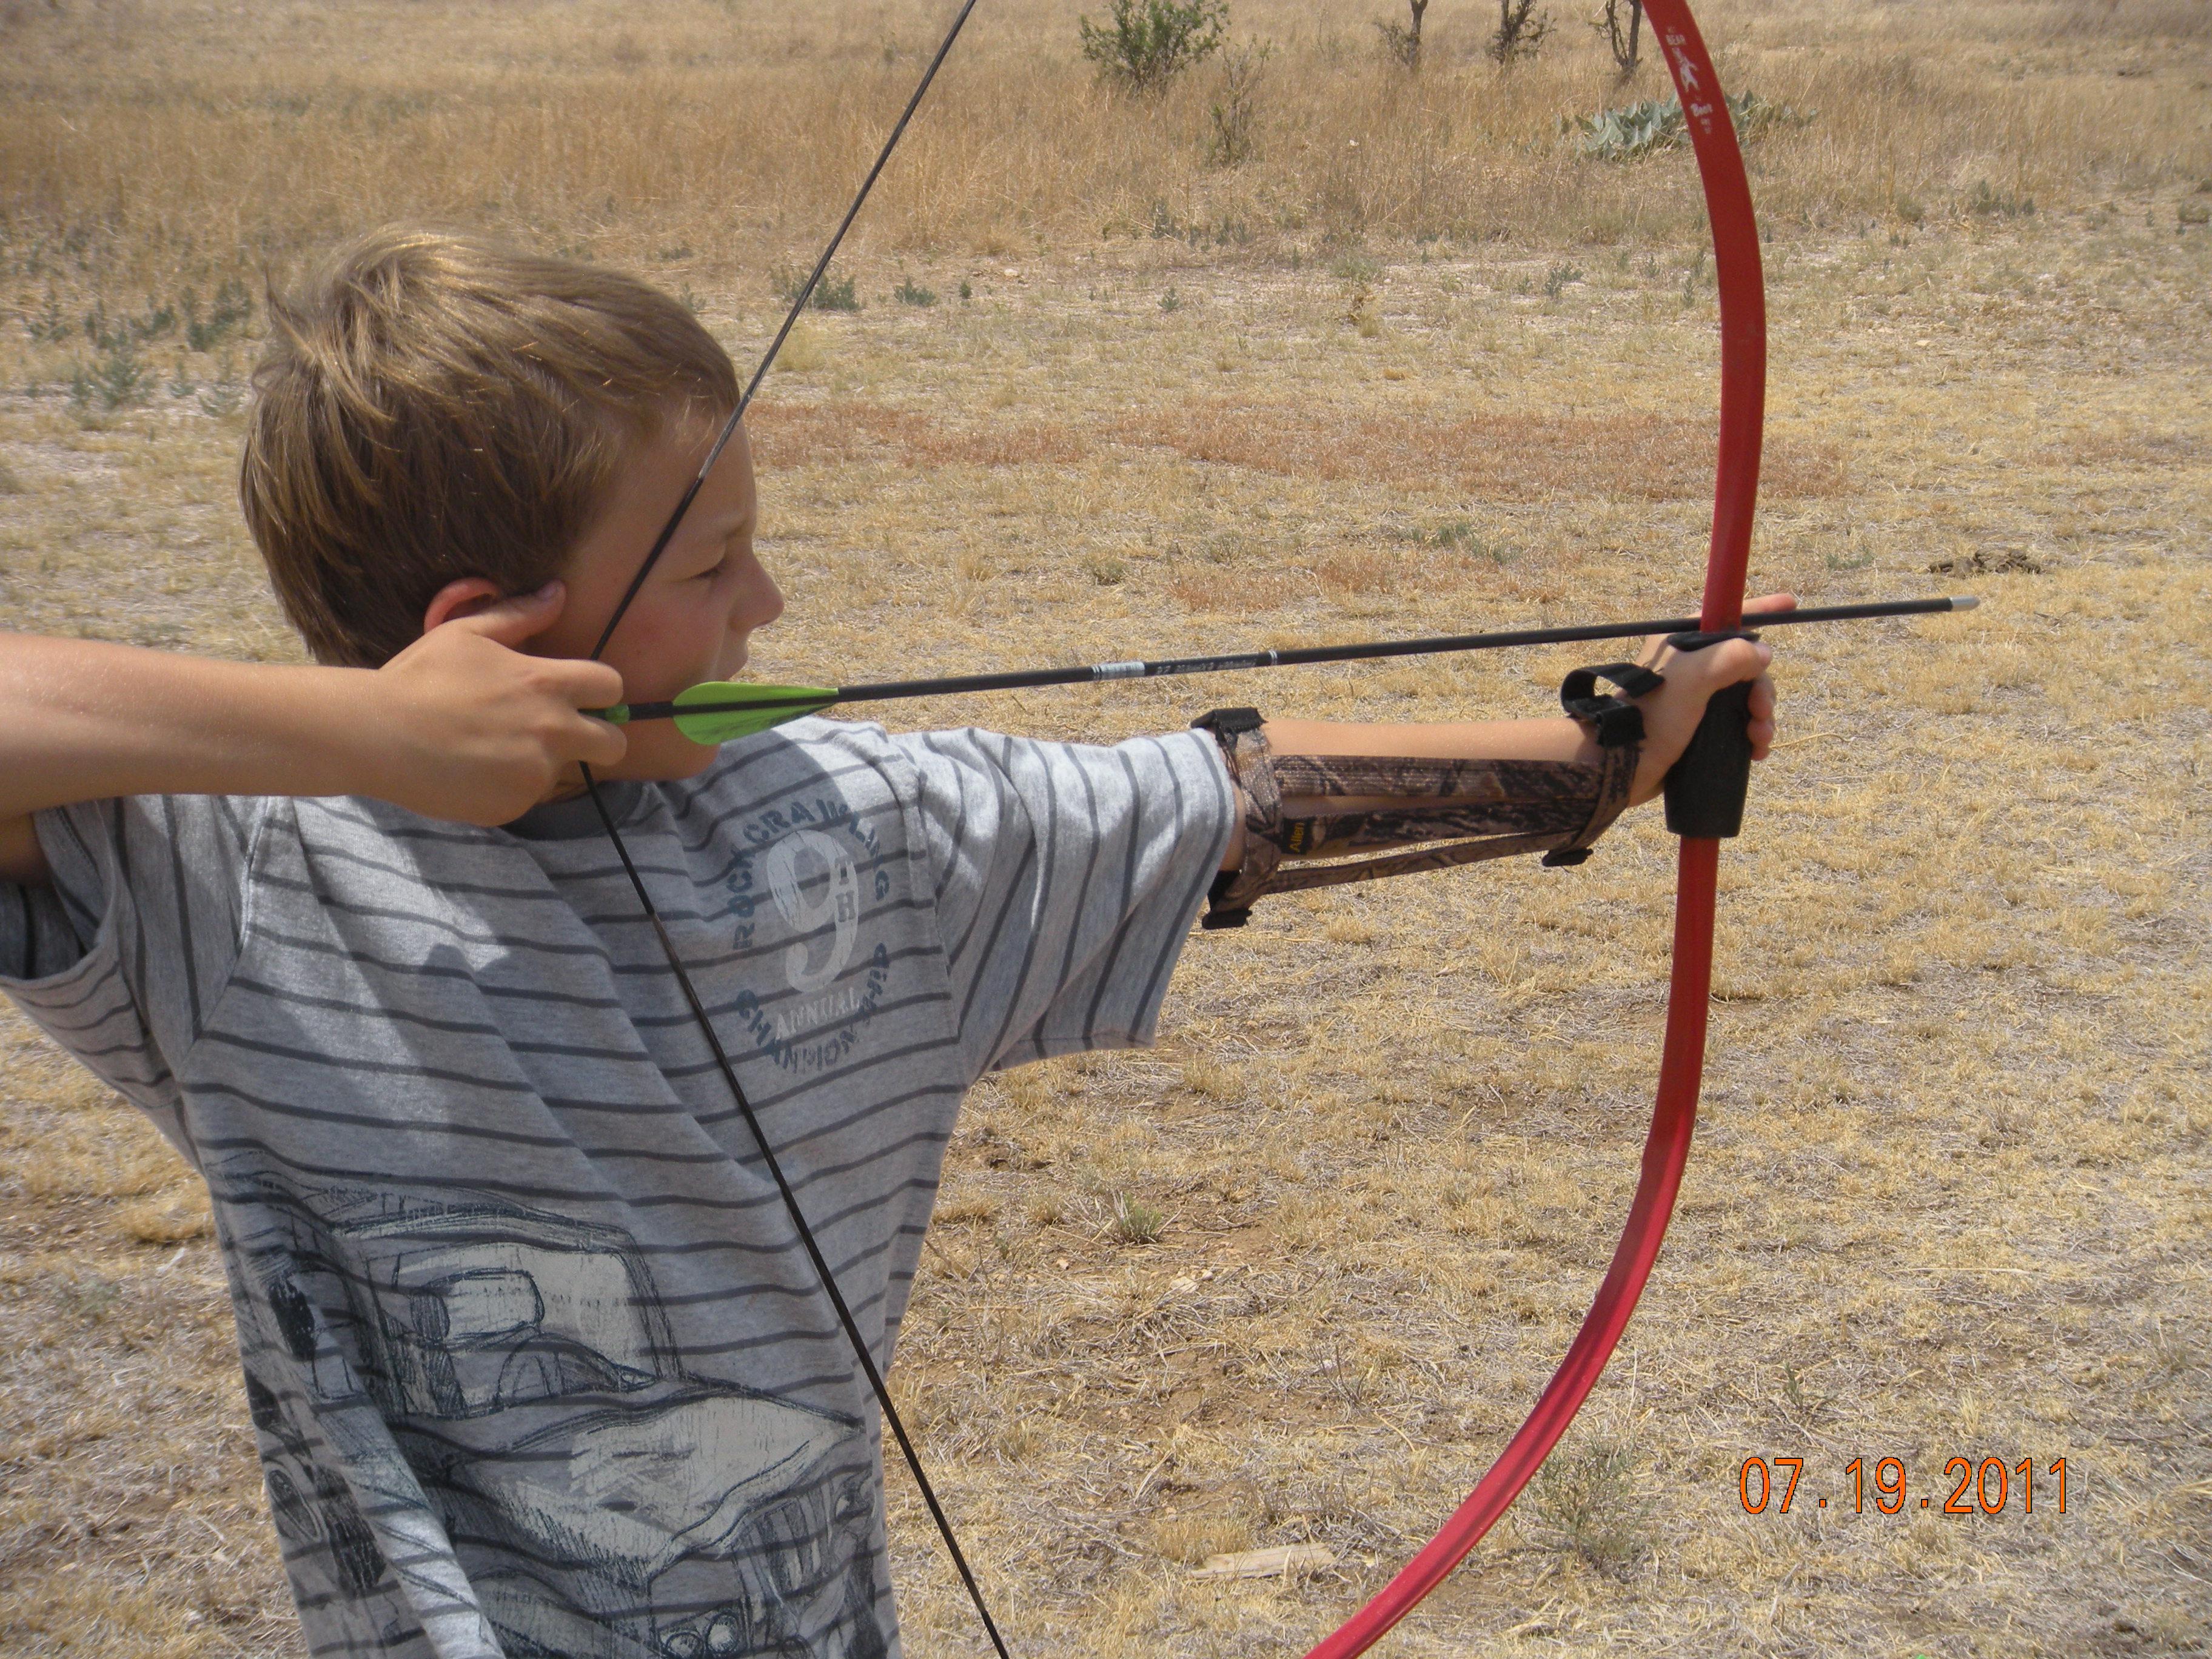 Archery Range